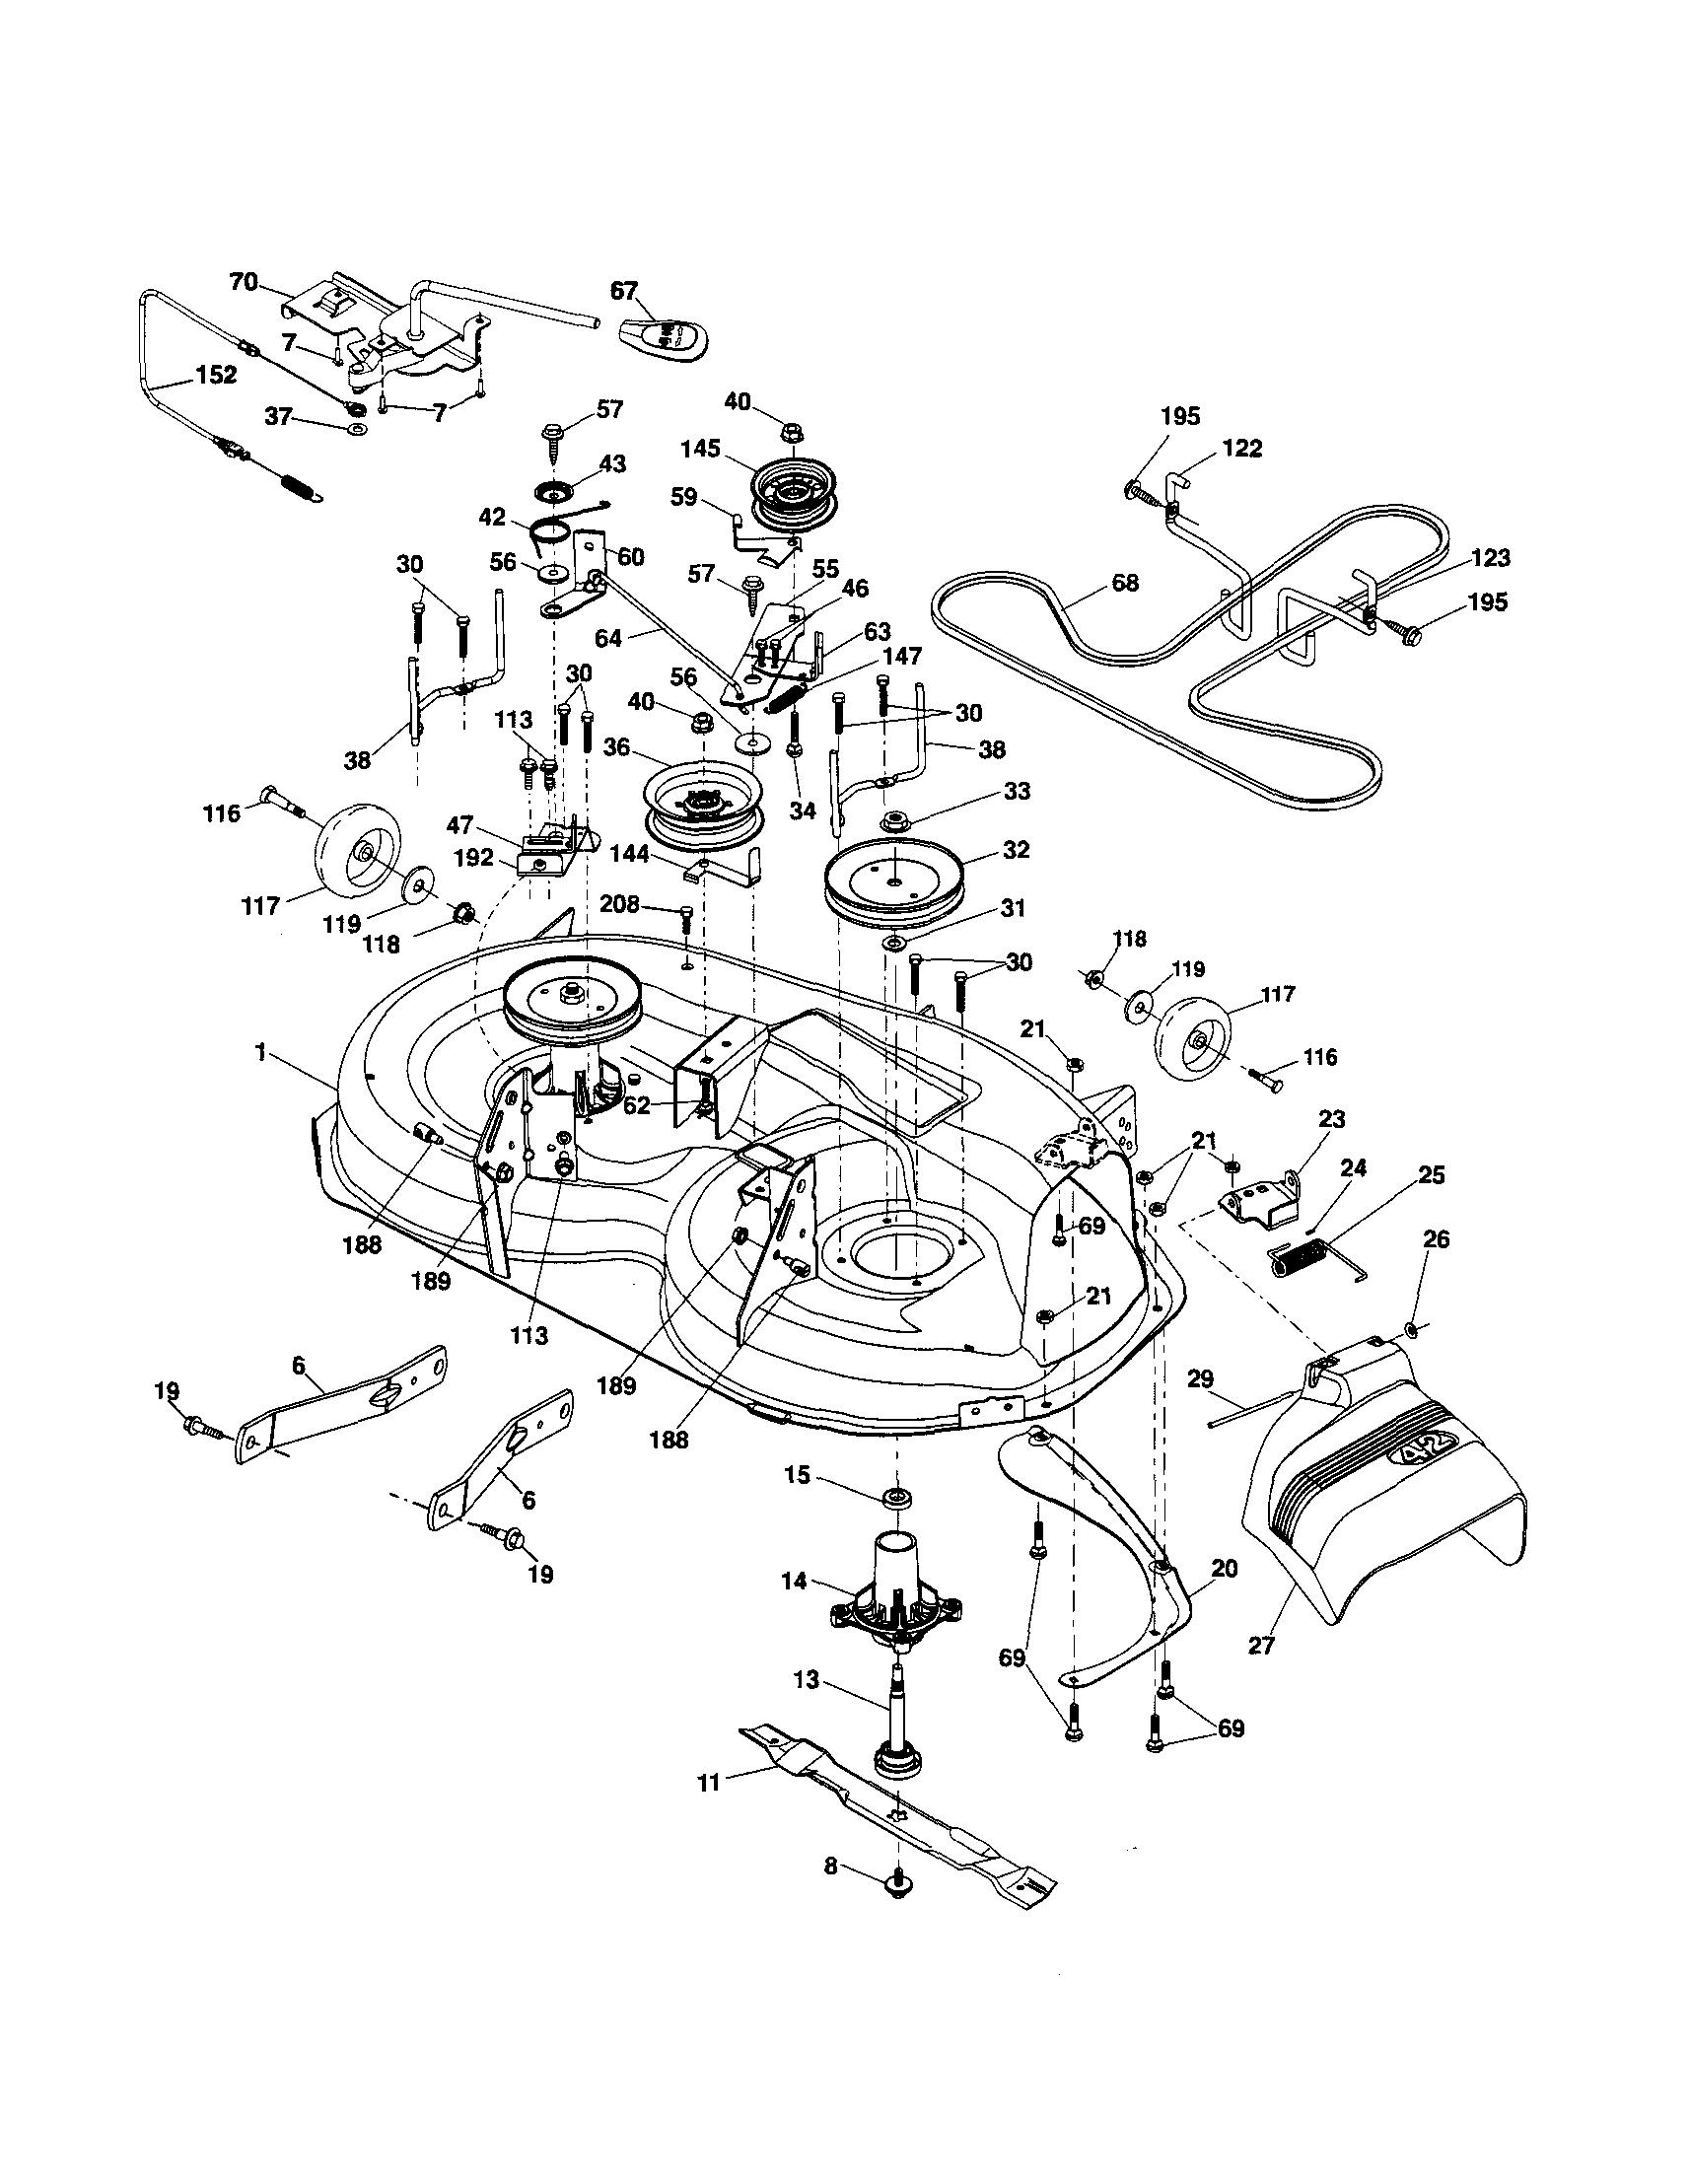 hight resolution of 116 john deere lawn tractor wiring diagram